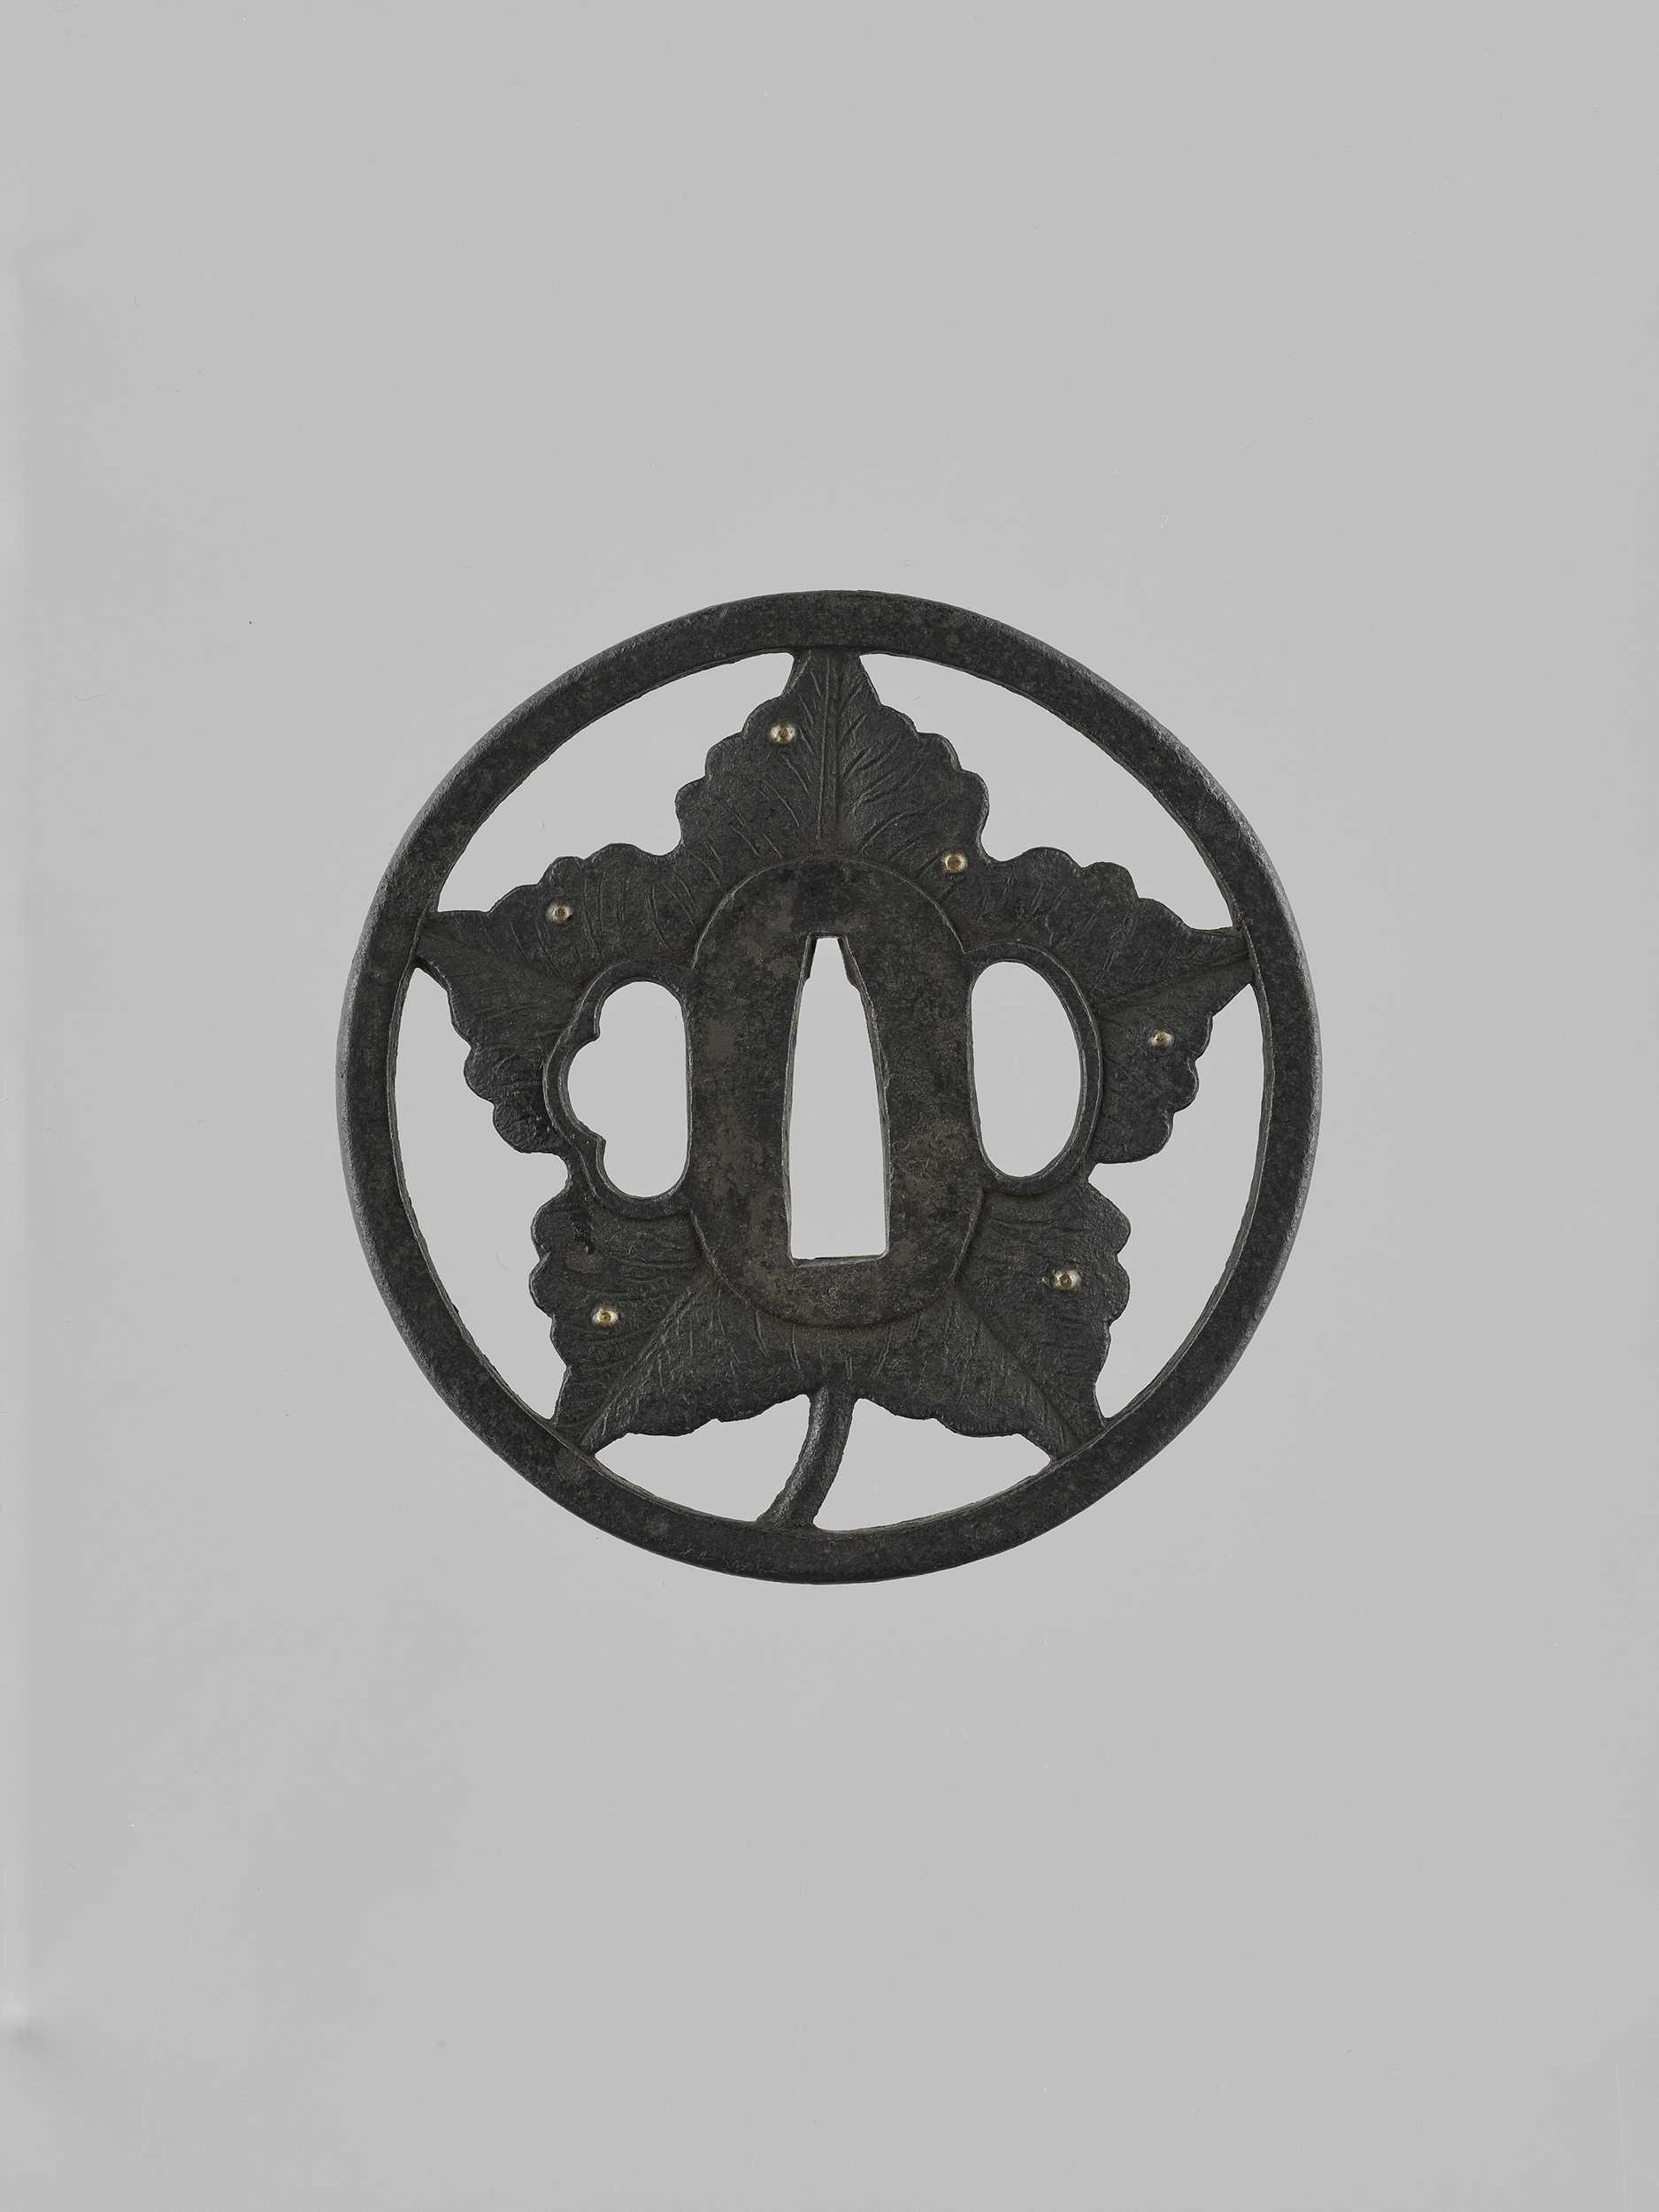 Lot 47 - AN IRON SUKASHI TSUBA